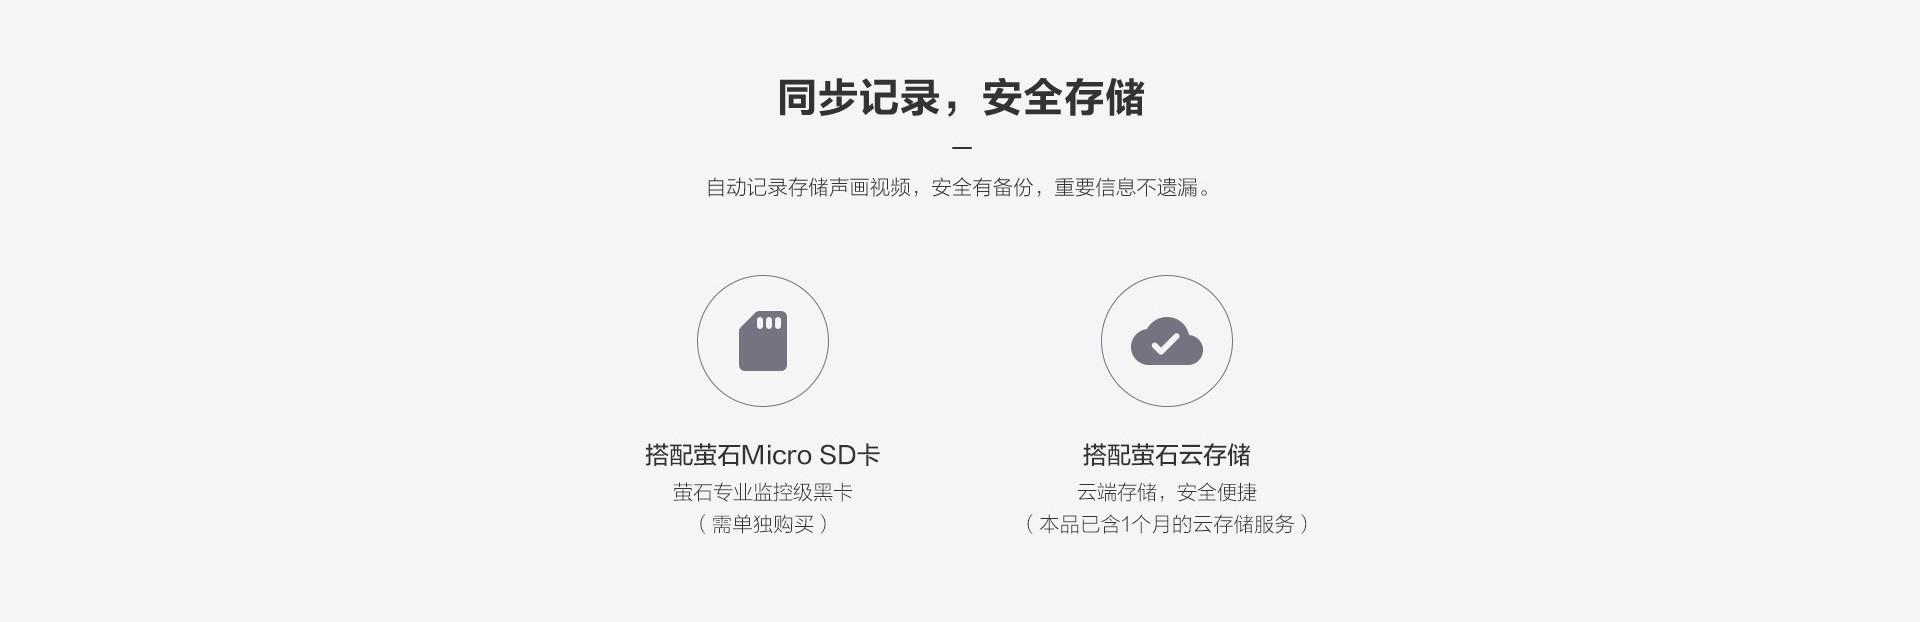 XP1-WEB_09.jpg